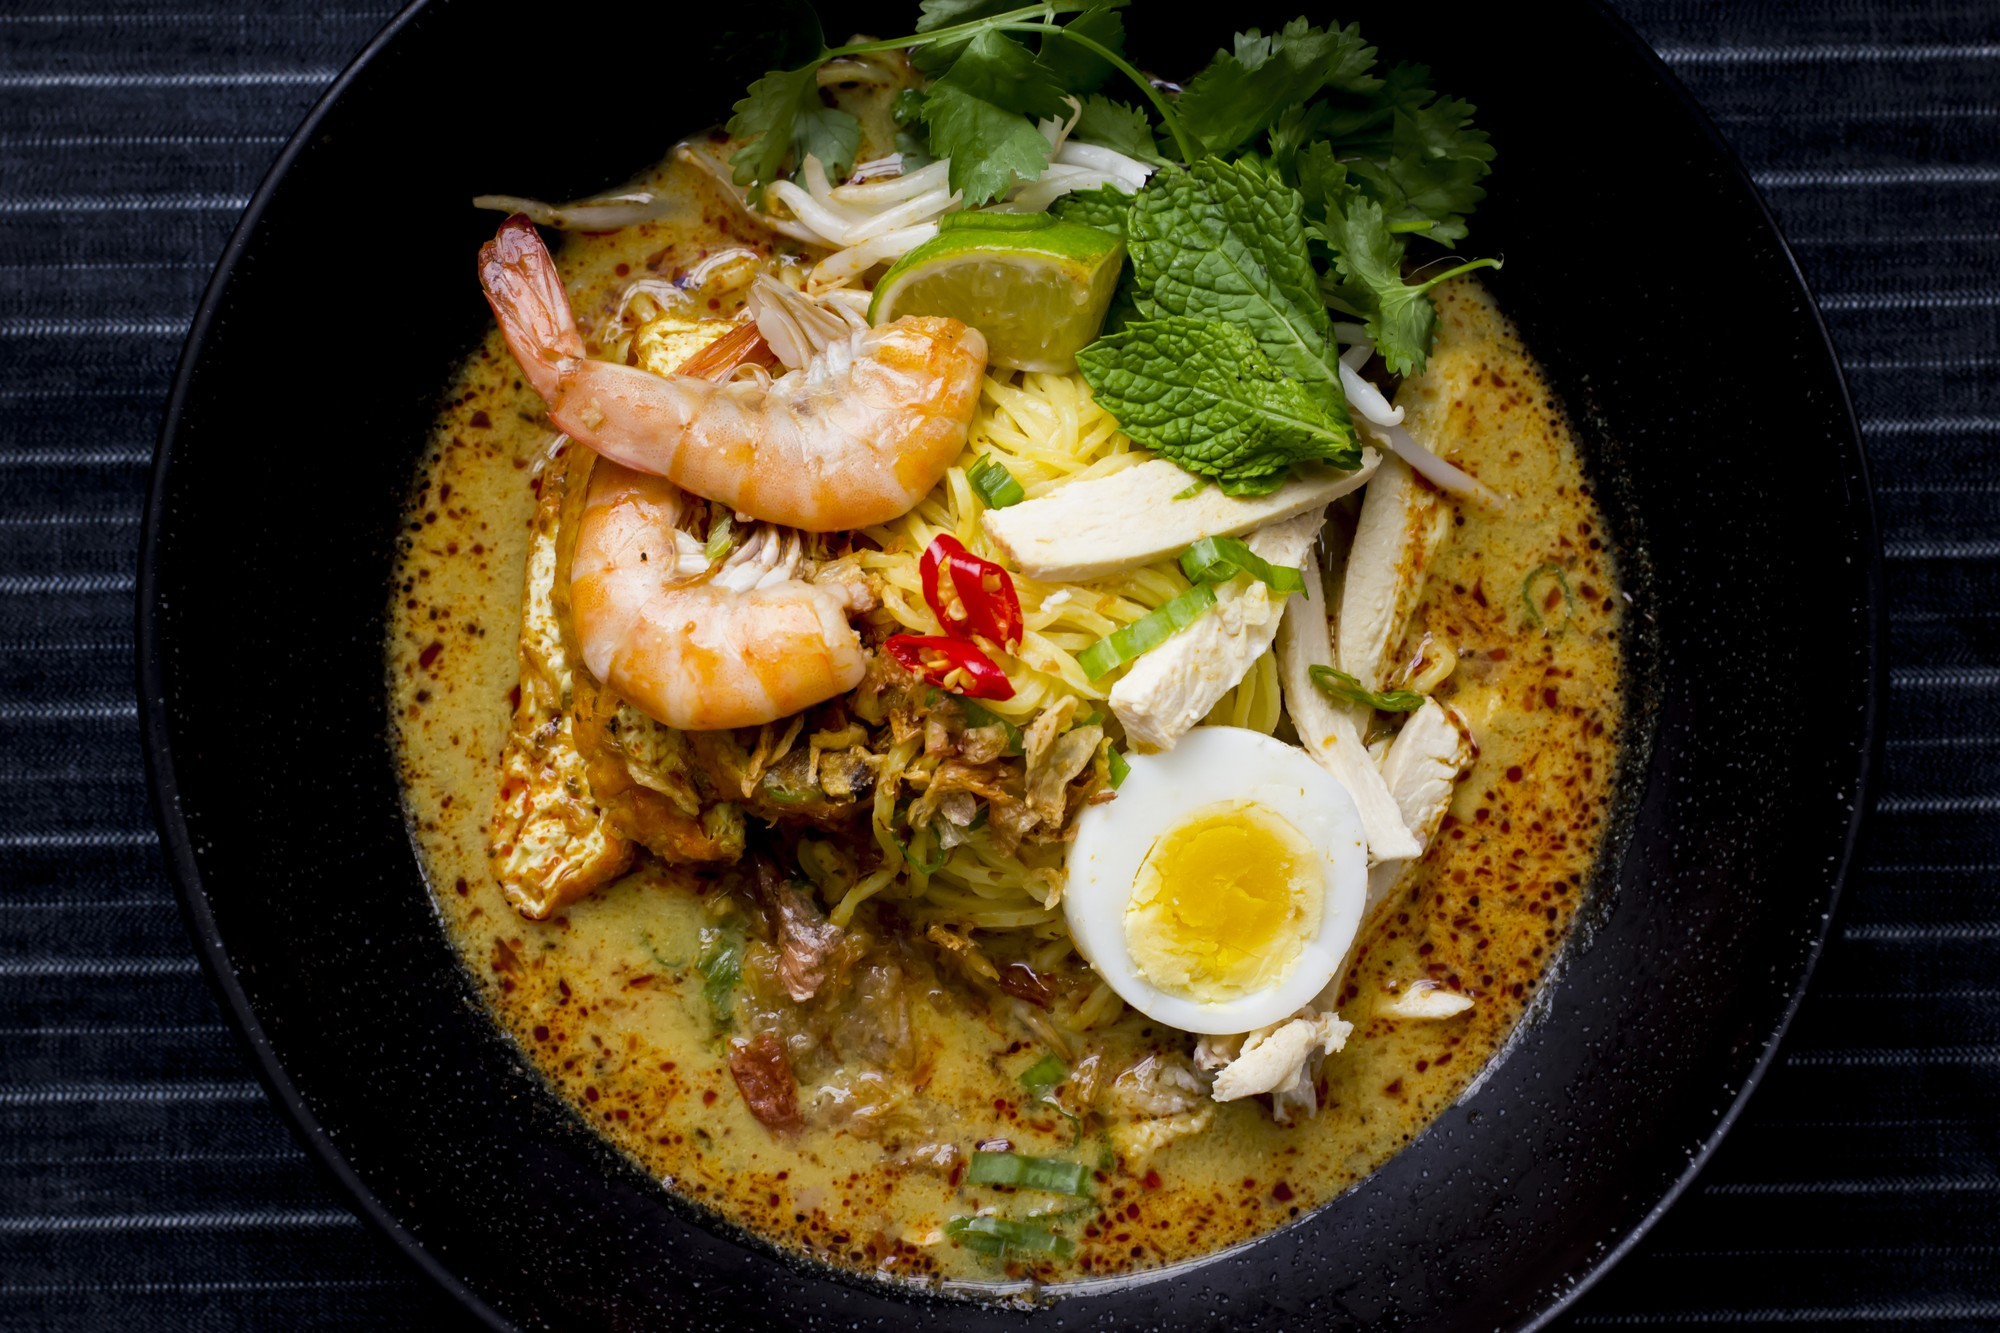 Malaysian Laksa Pop-Up Plans Permanent Home for Noodle Soups